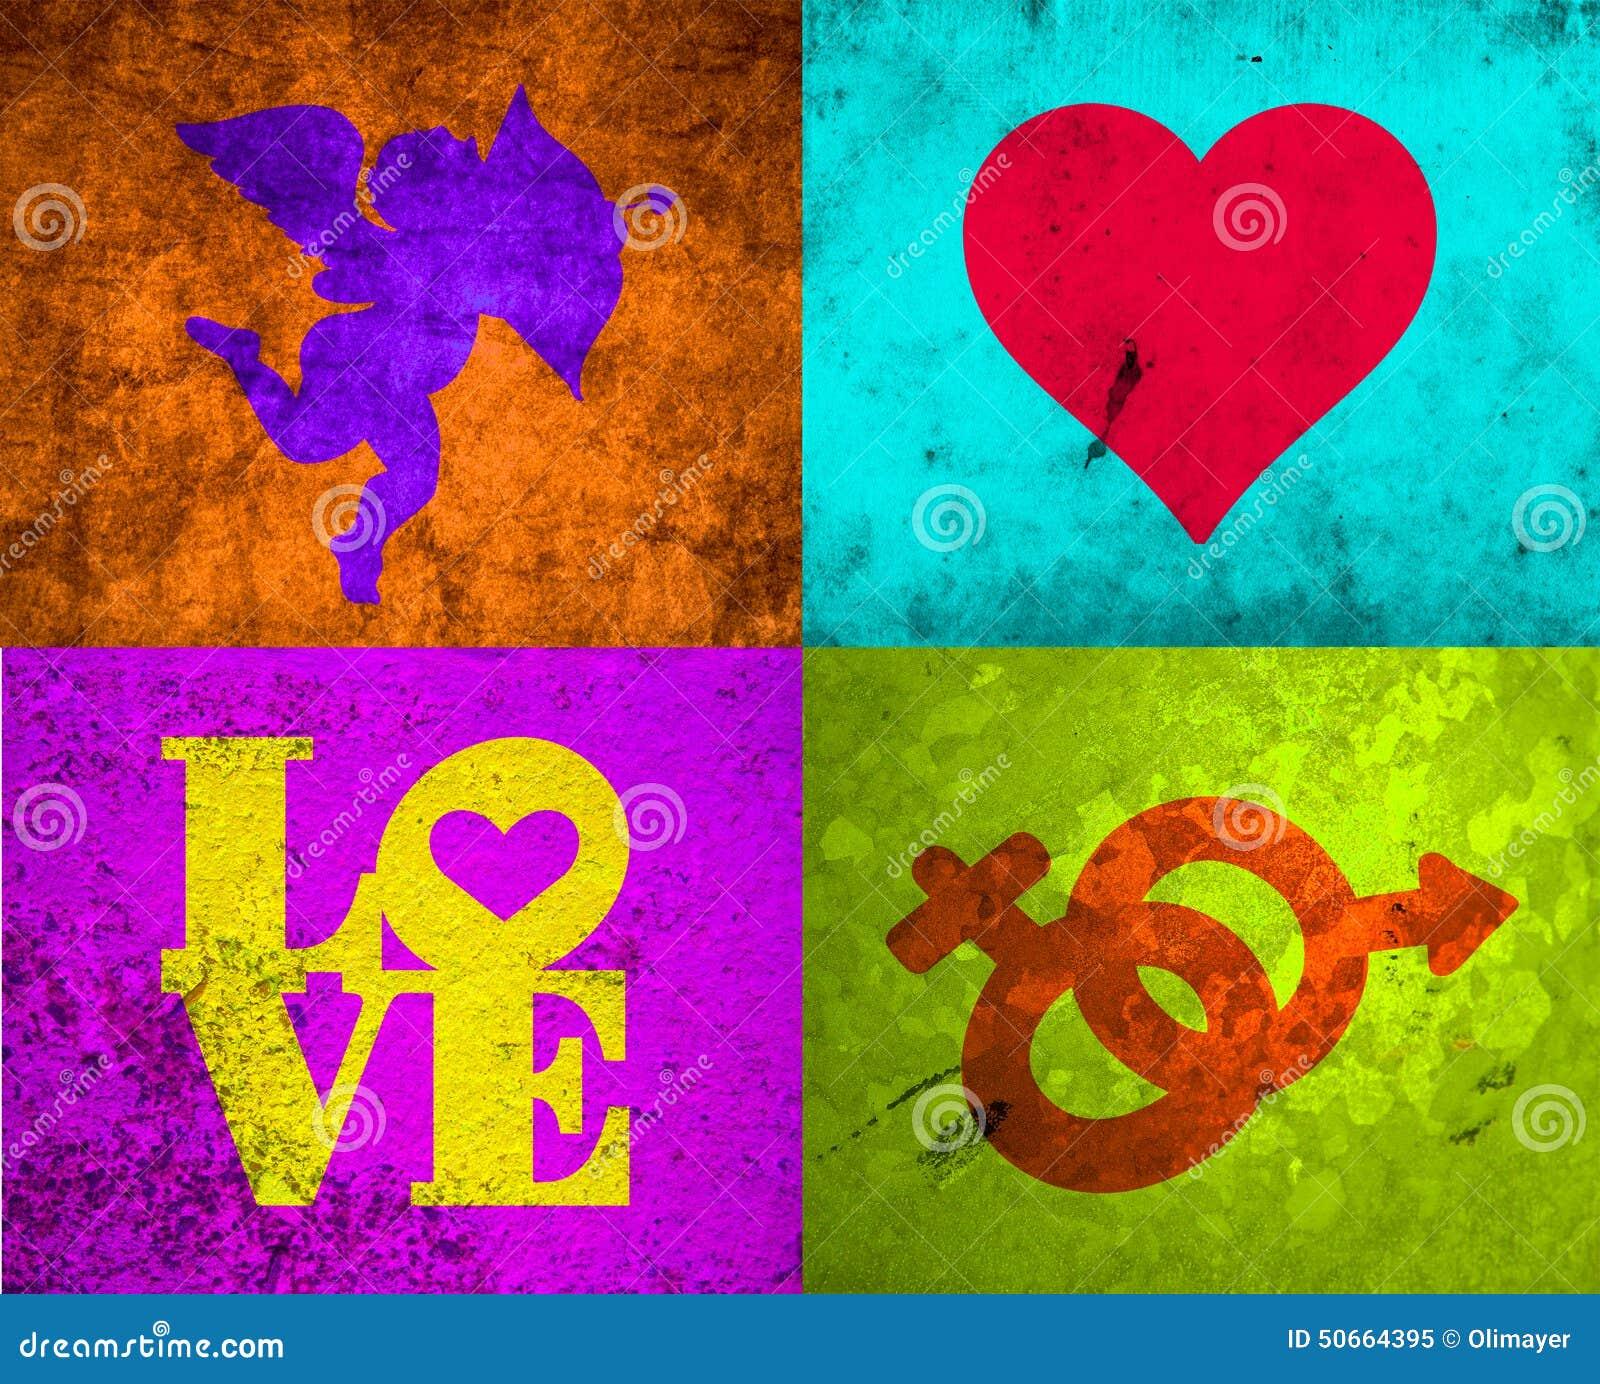 Grunge love stock illustration illustration of birthday 50664395 royalty free illustration biocorpaavc Images